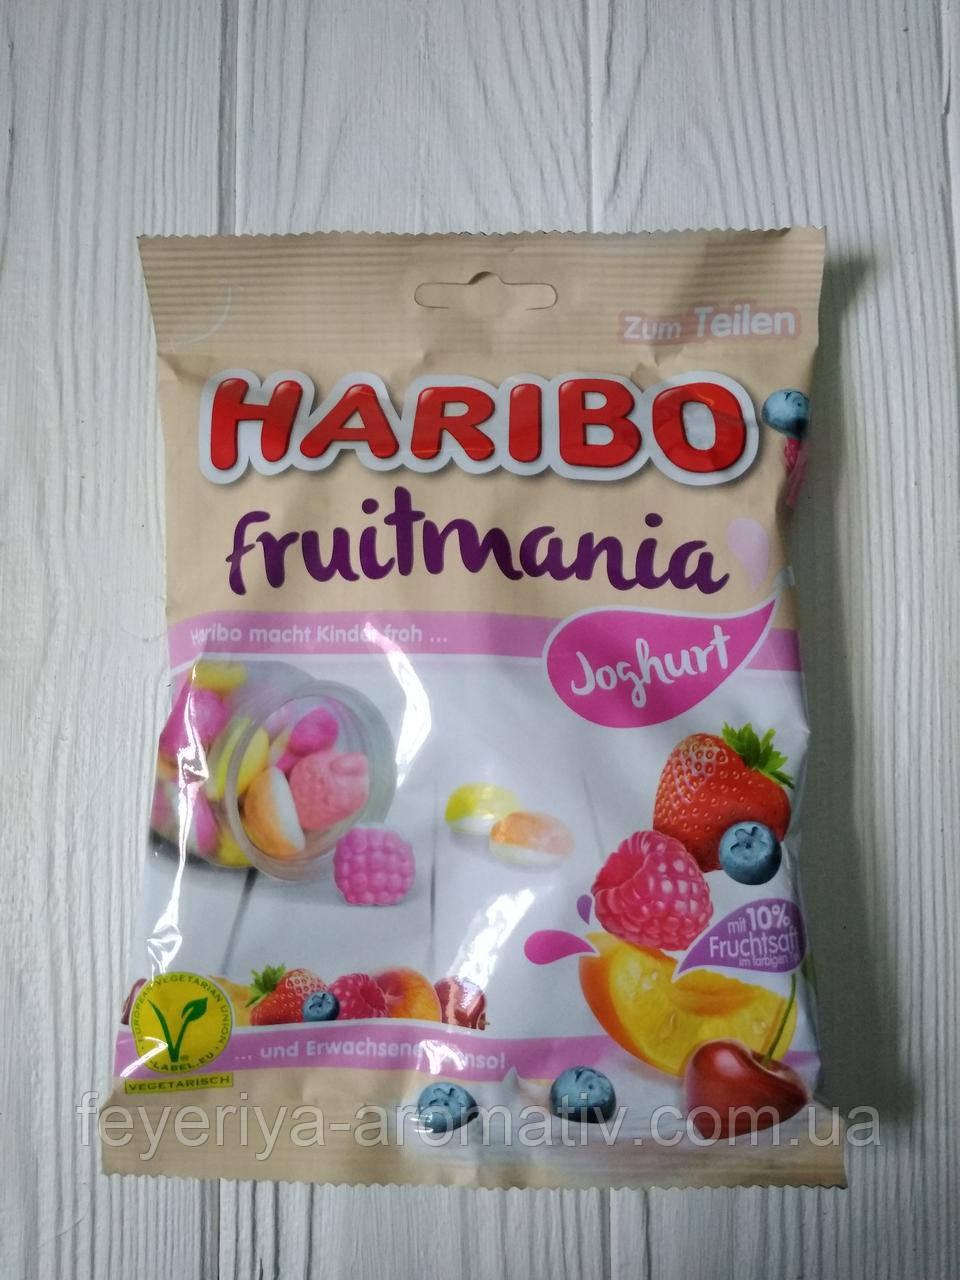 Желейные конфеты Haribo Fruitmania Joghurt 175гр. (Германия)